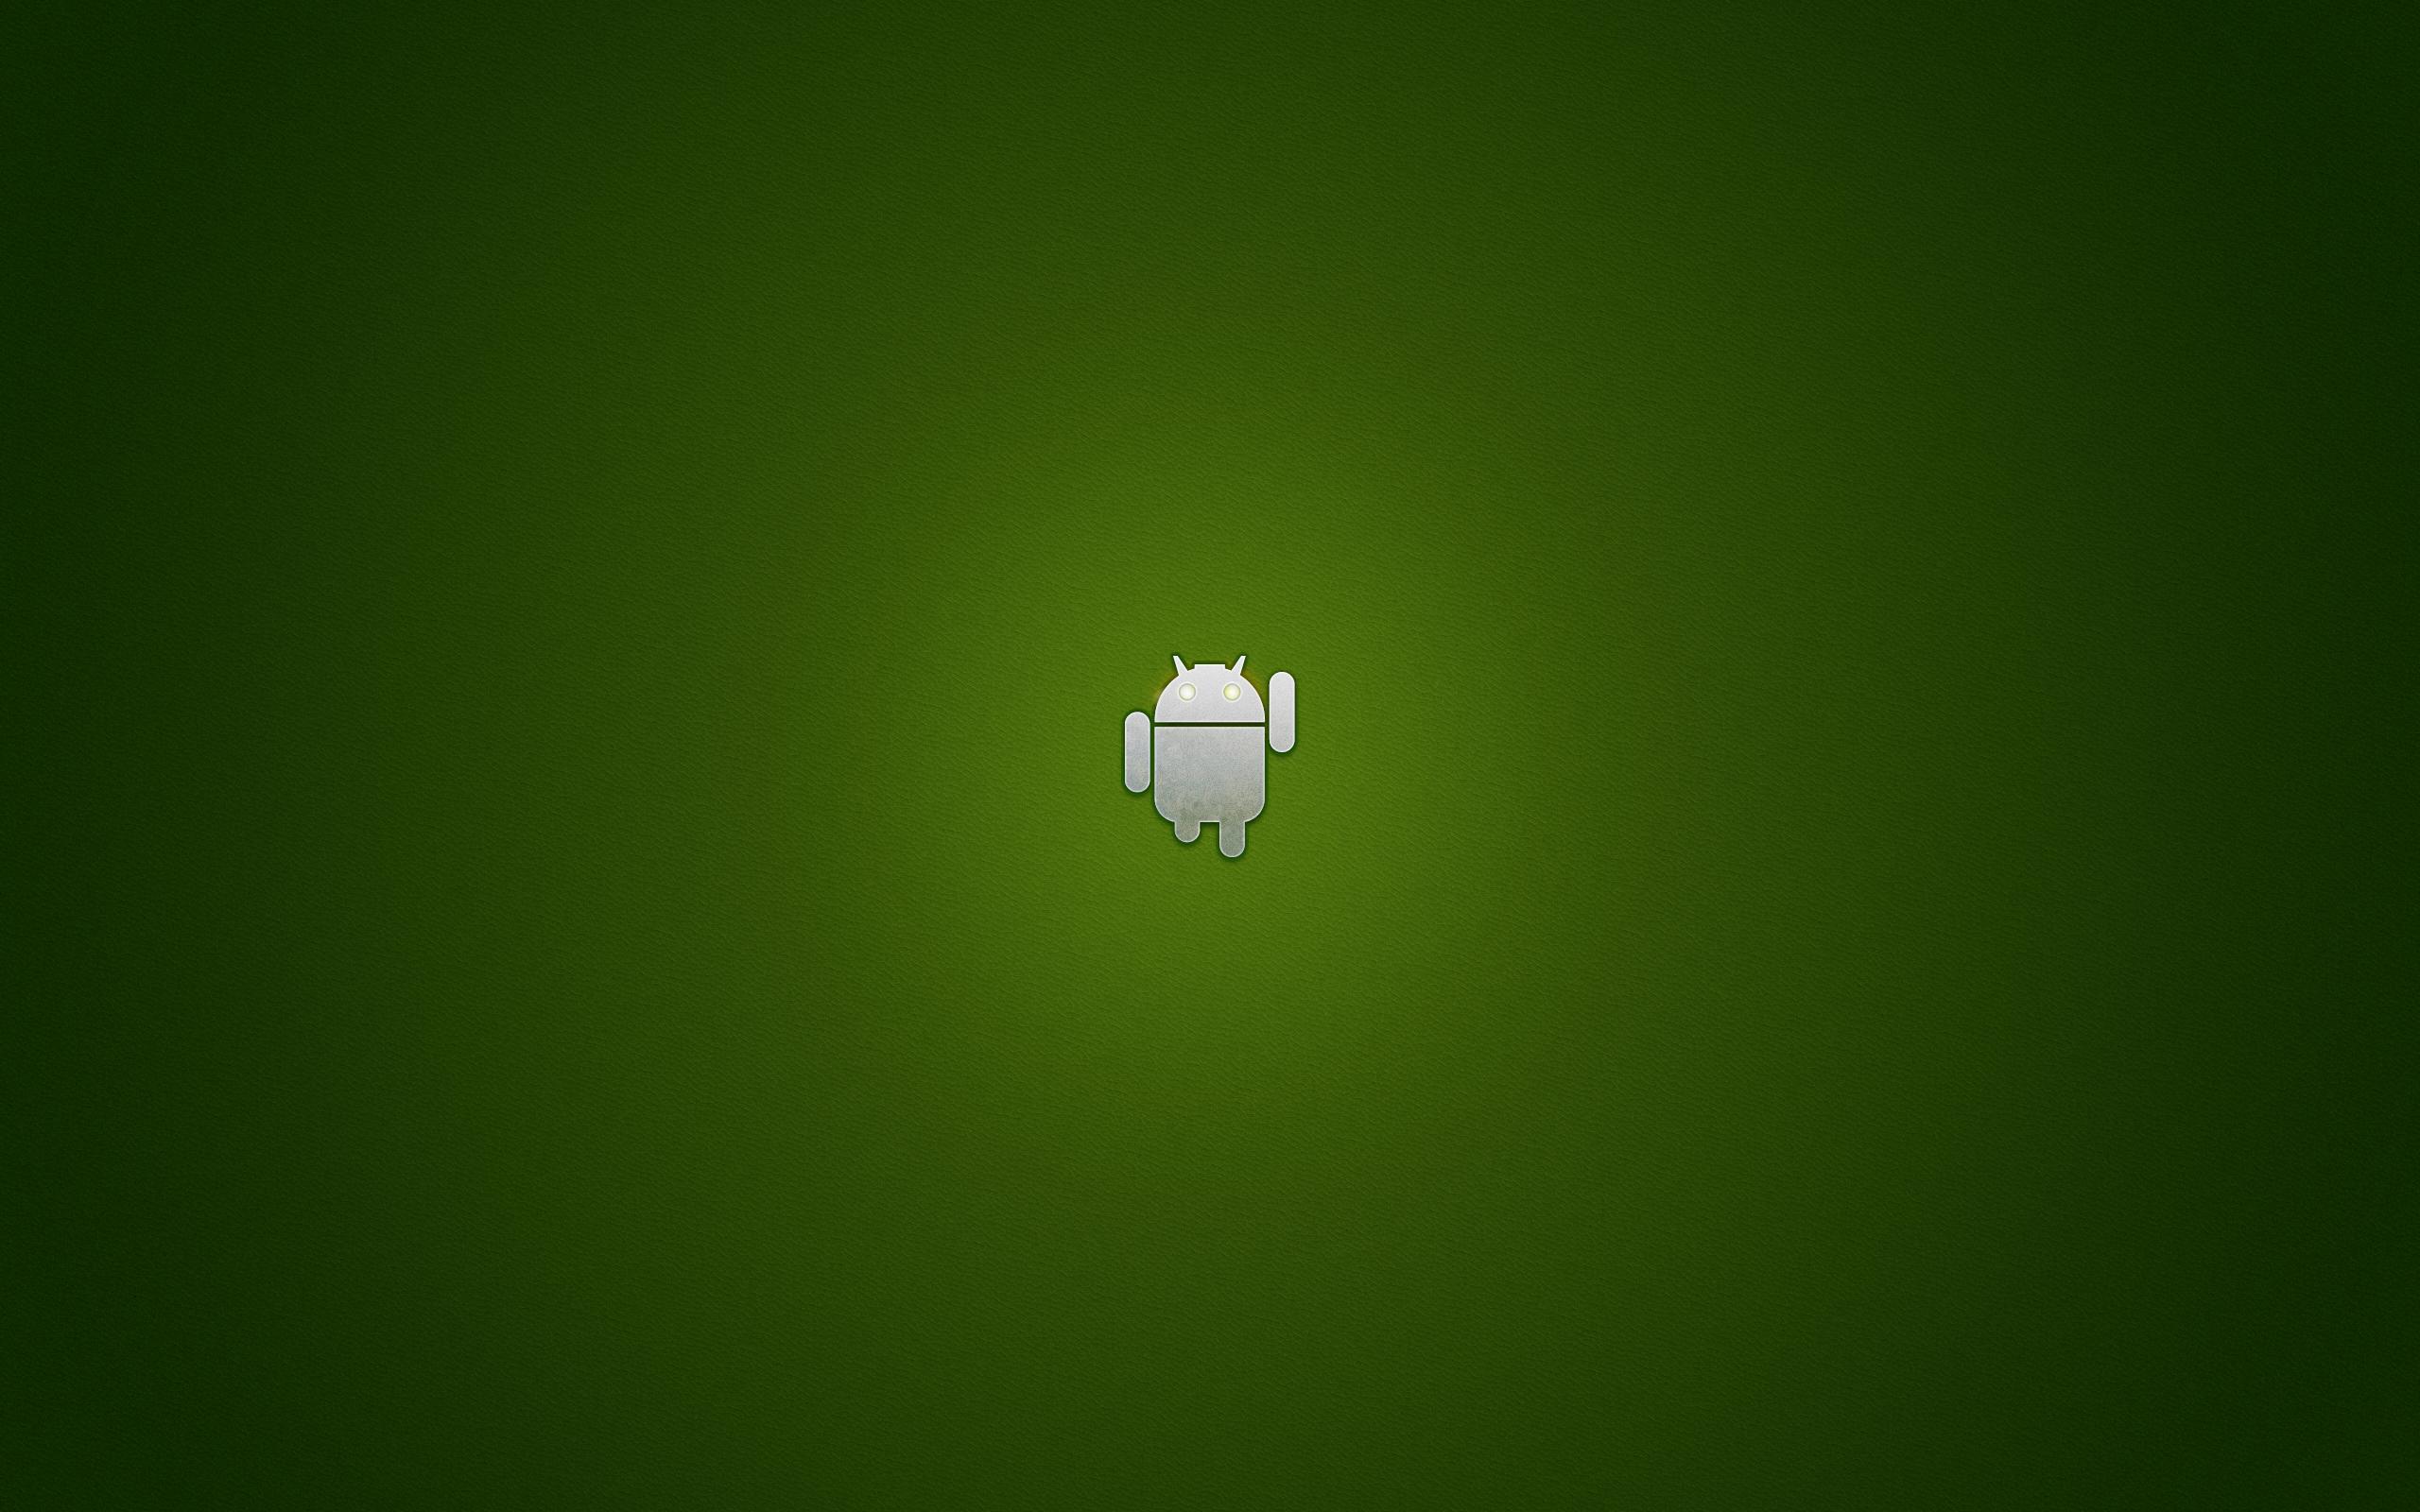 android green wallpaperspikepass on deviantart